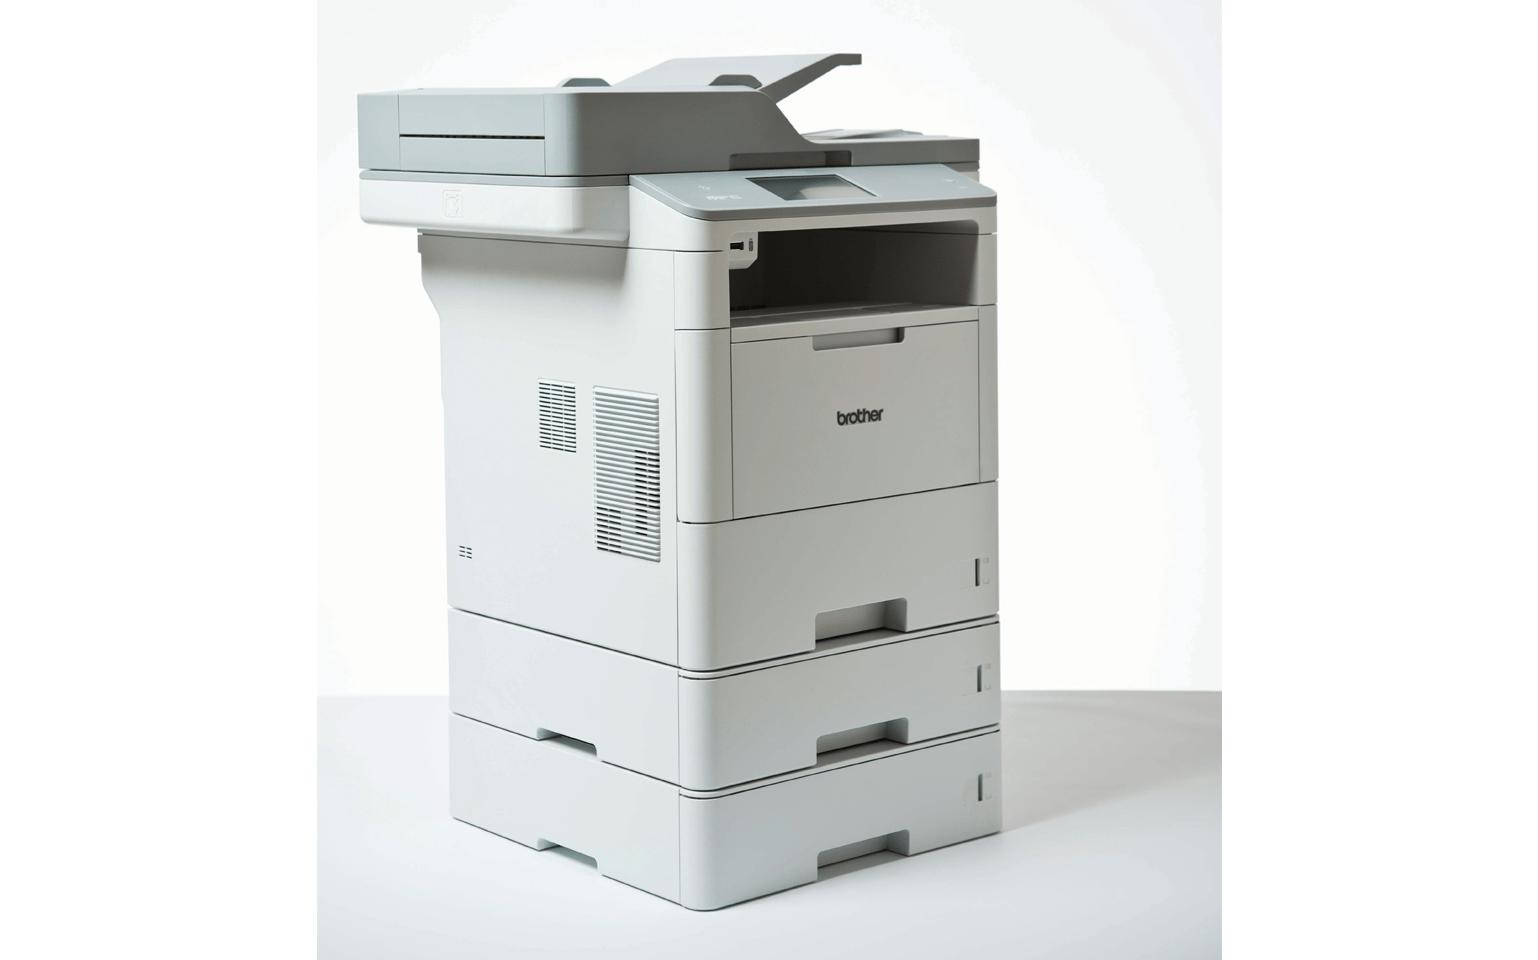 MFC-L6900DW Wireless Mono Laser Printer 6